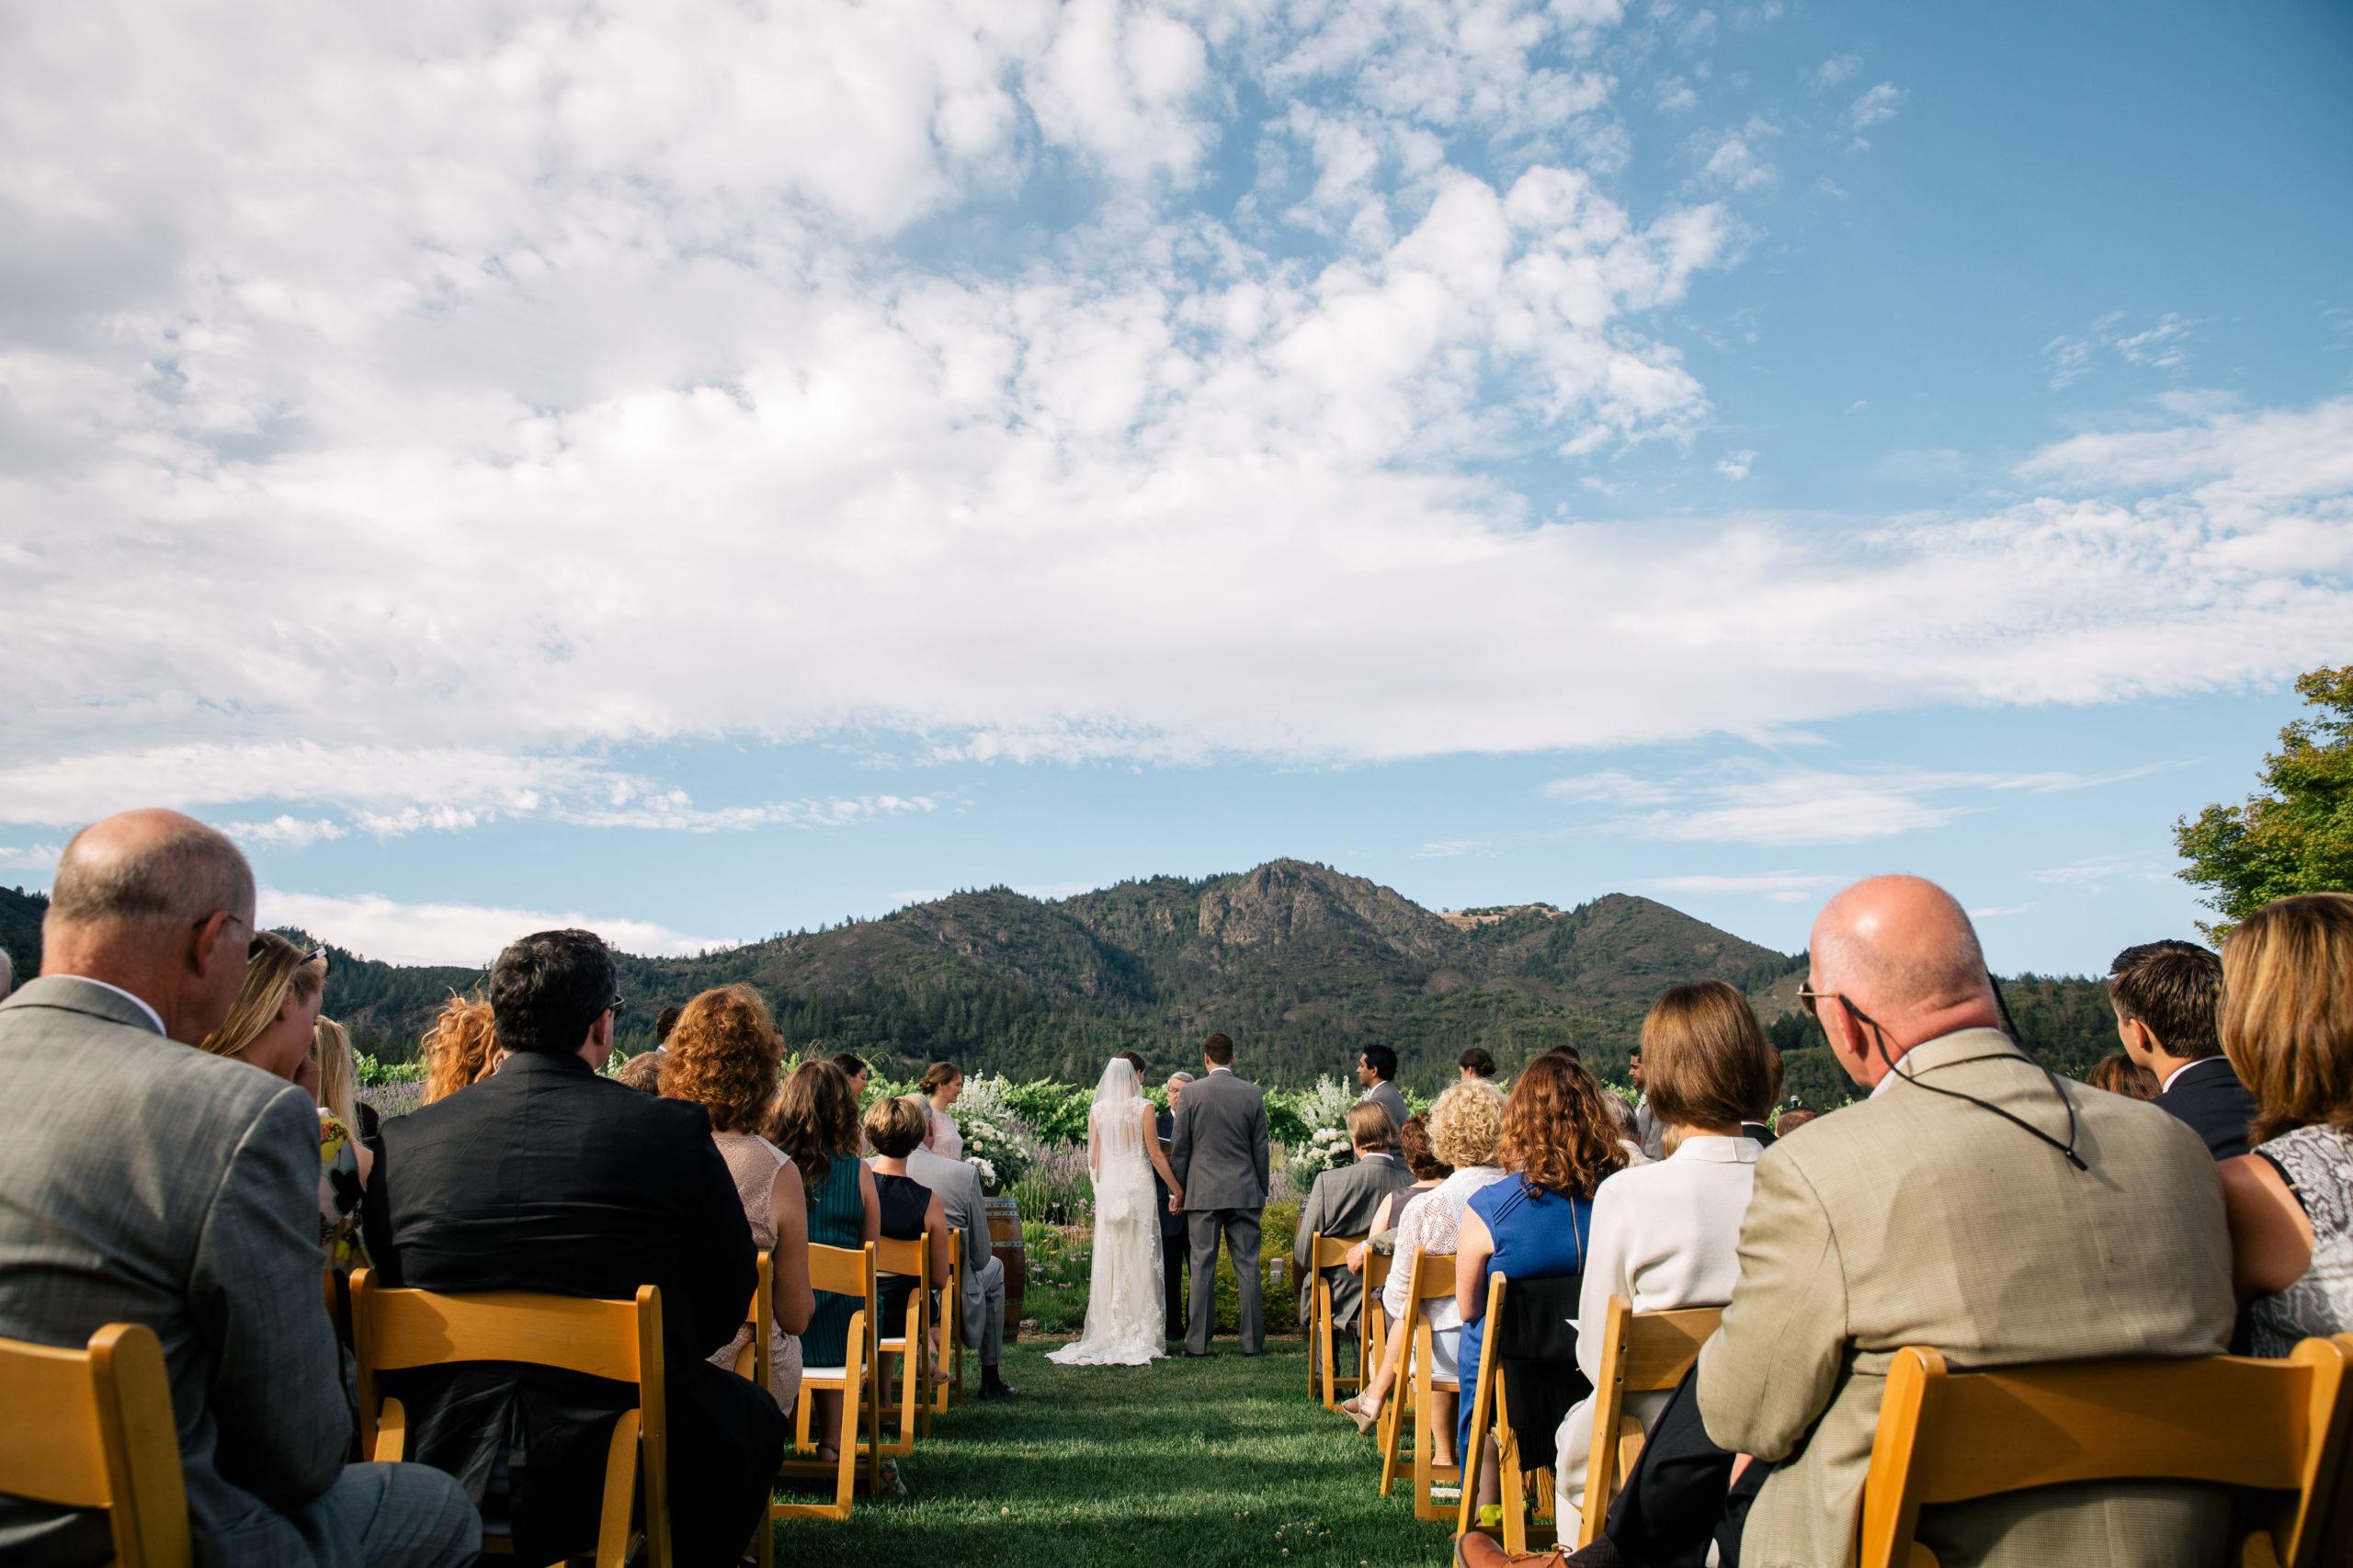 Are Wedding Venue Deposits Refundable?